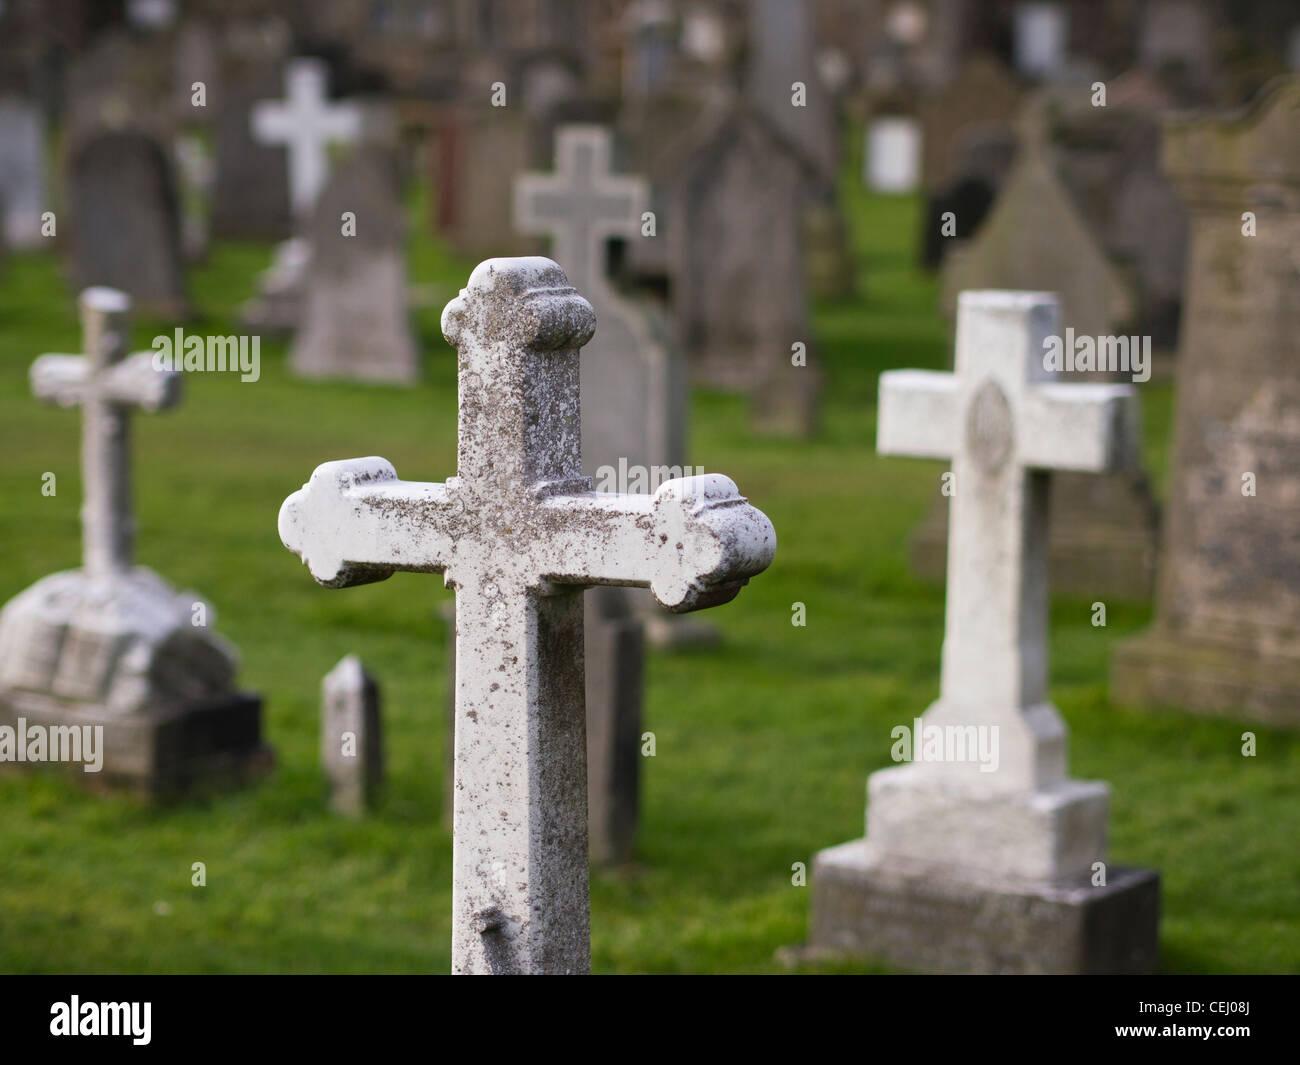 Crucifix gravestones in a cemetery st andrews scotland stock crucifix gravestones in a cemetery st andrews scotland buycottarizona